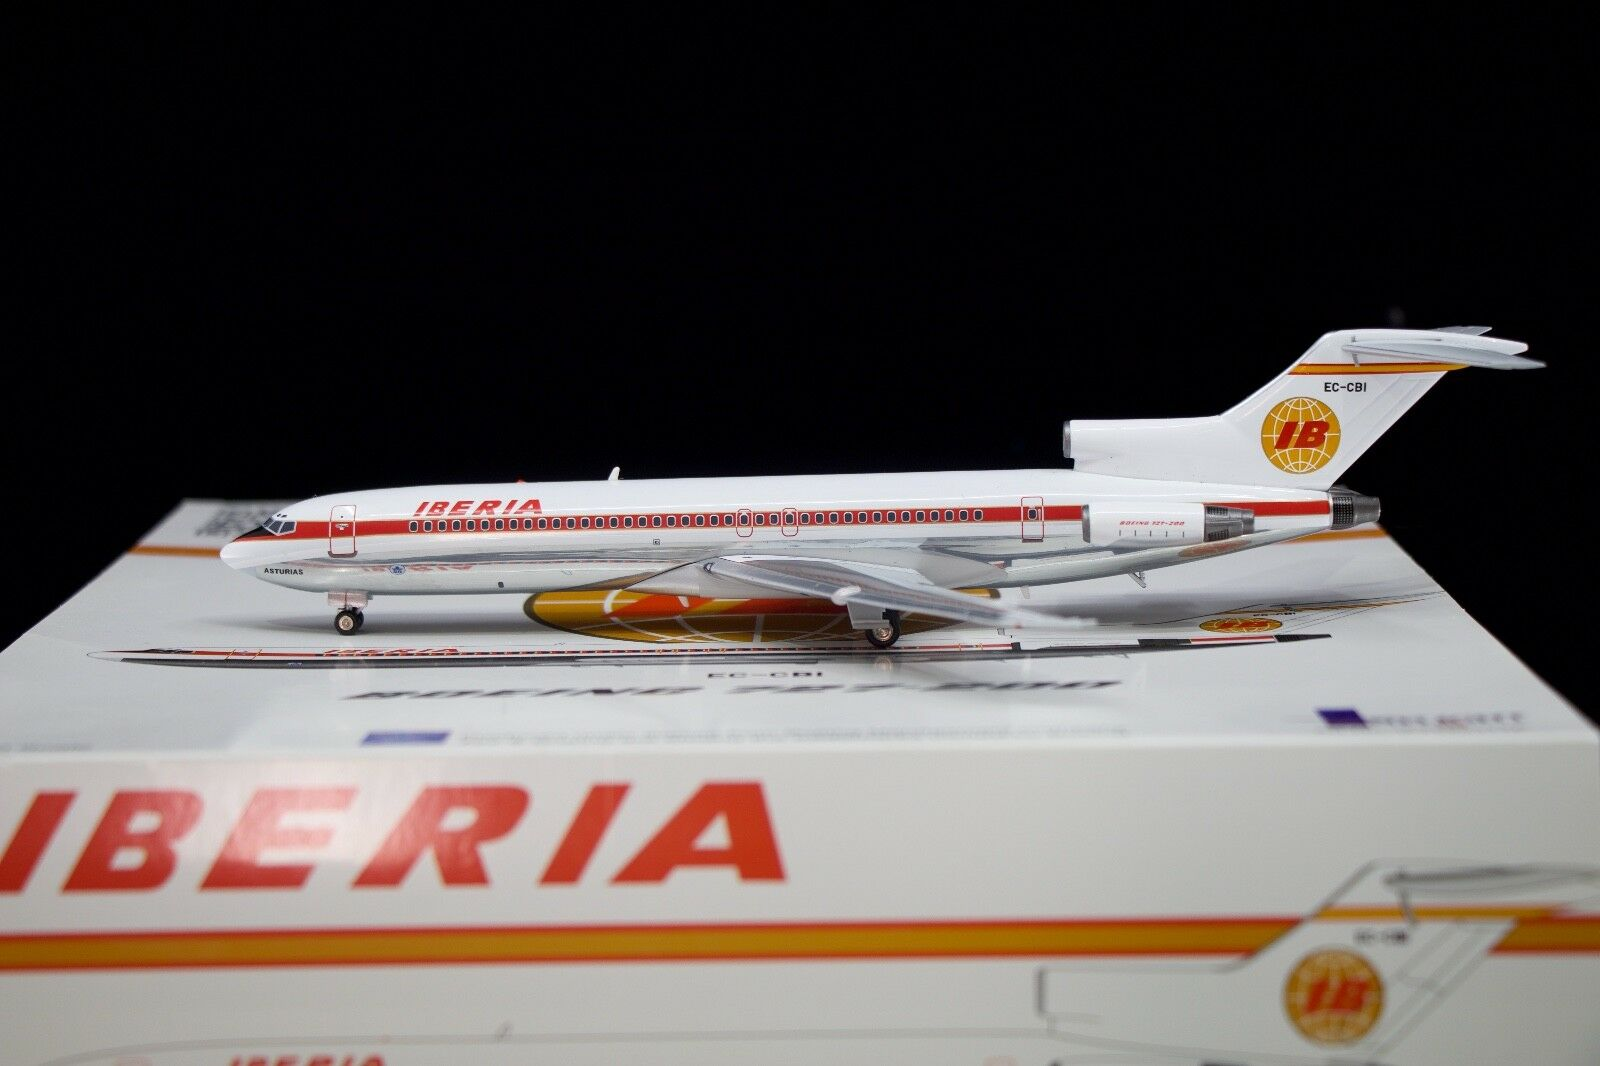 Inflight200 1/200 Iberia 727-200 EC-CBI